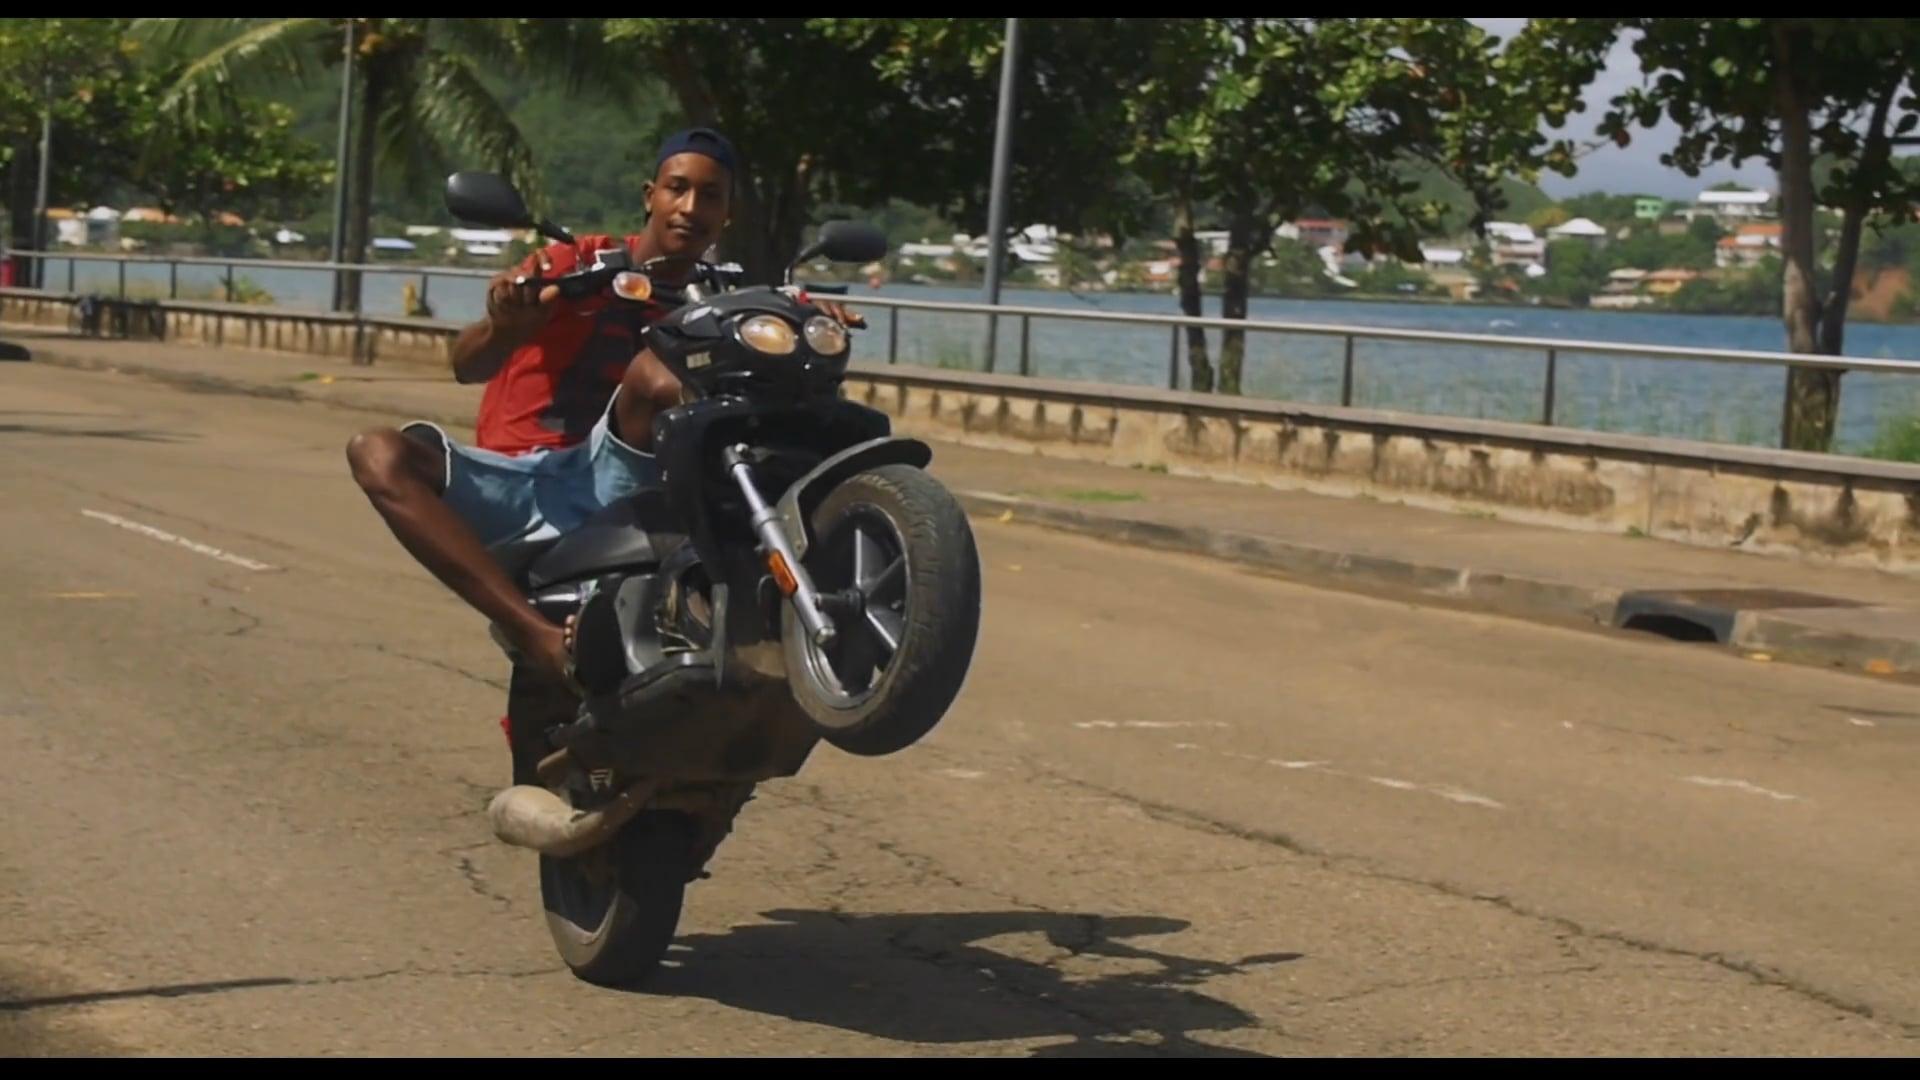 Street life (Volume. 3) - Tartane, Martinique